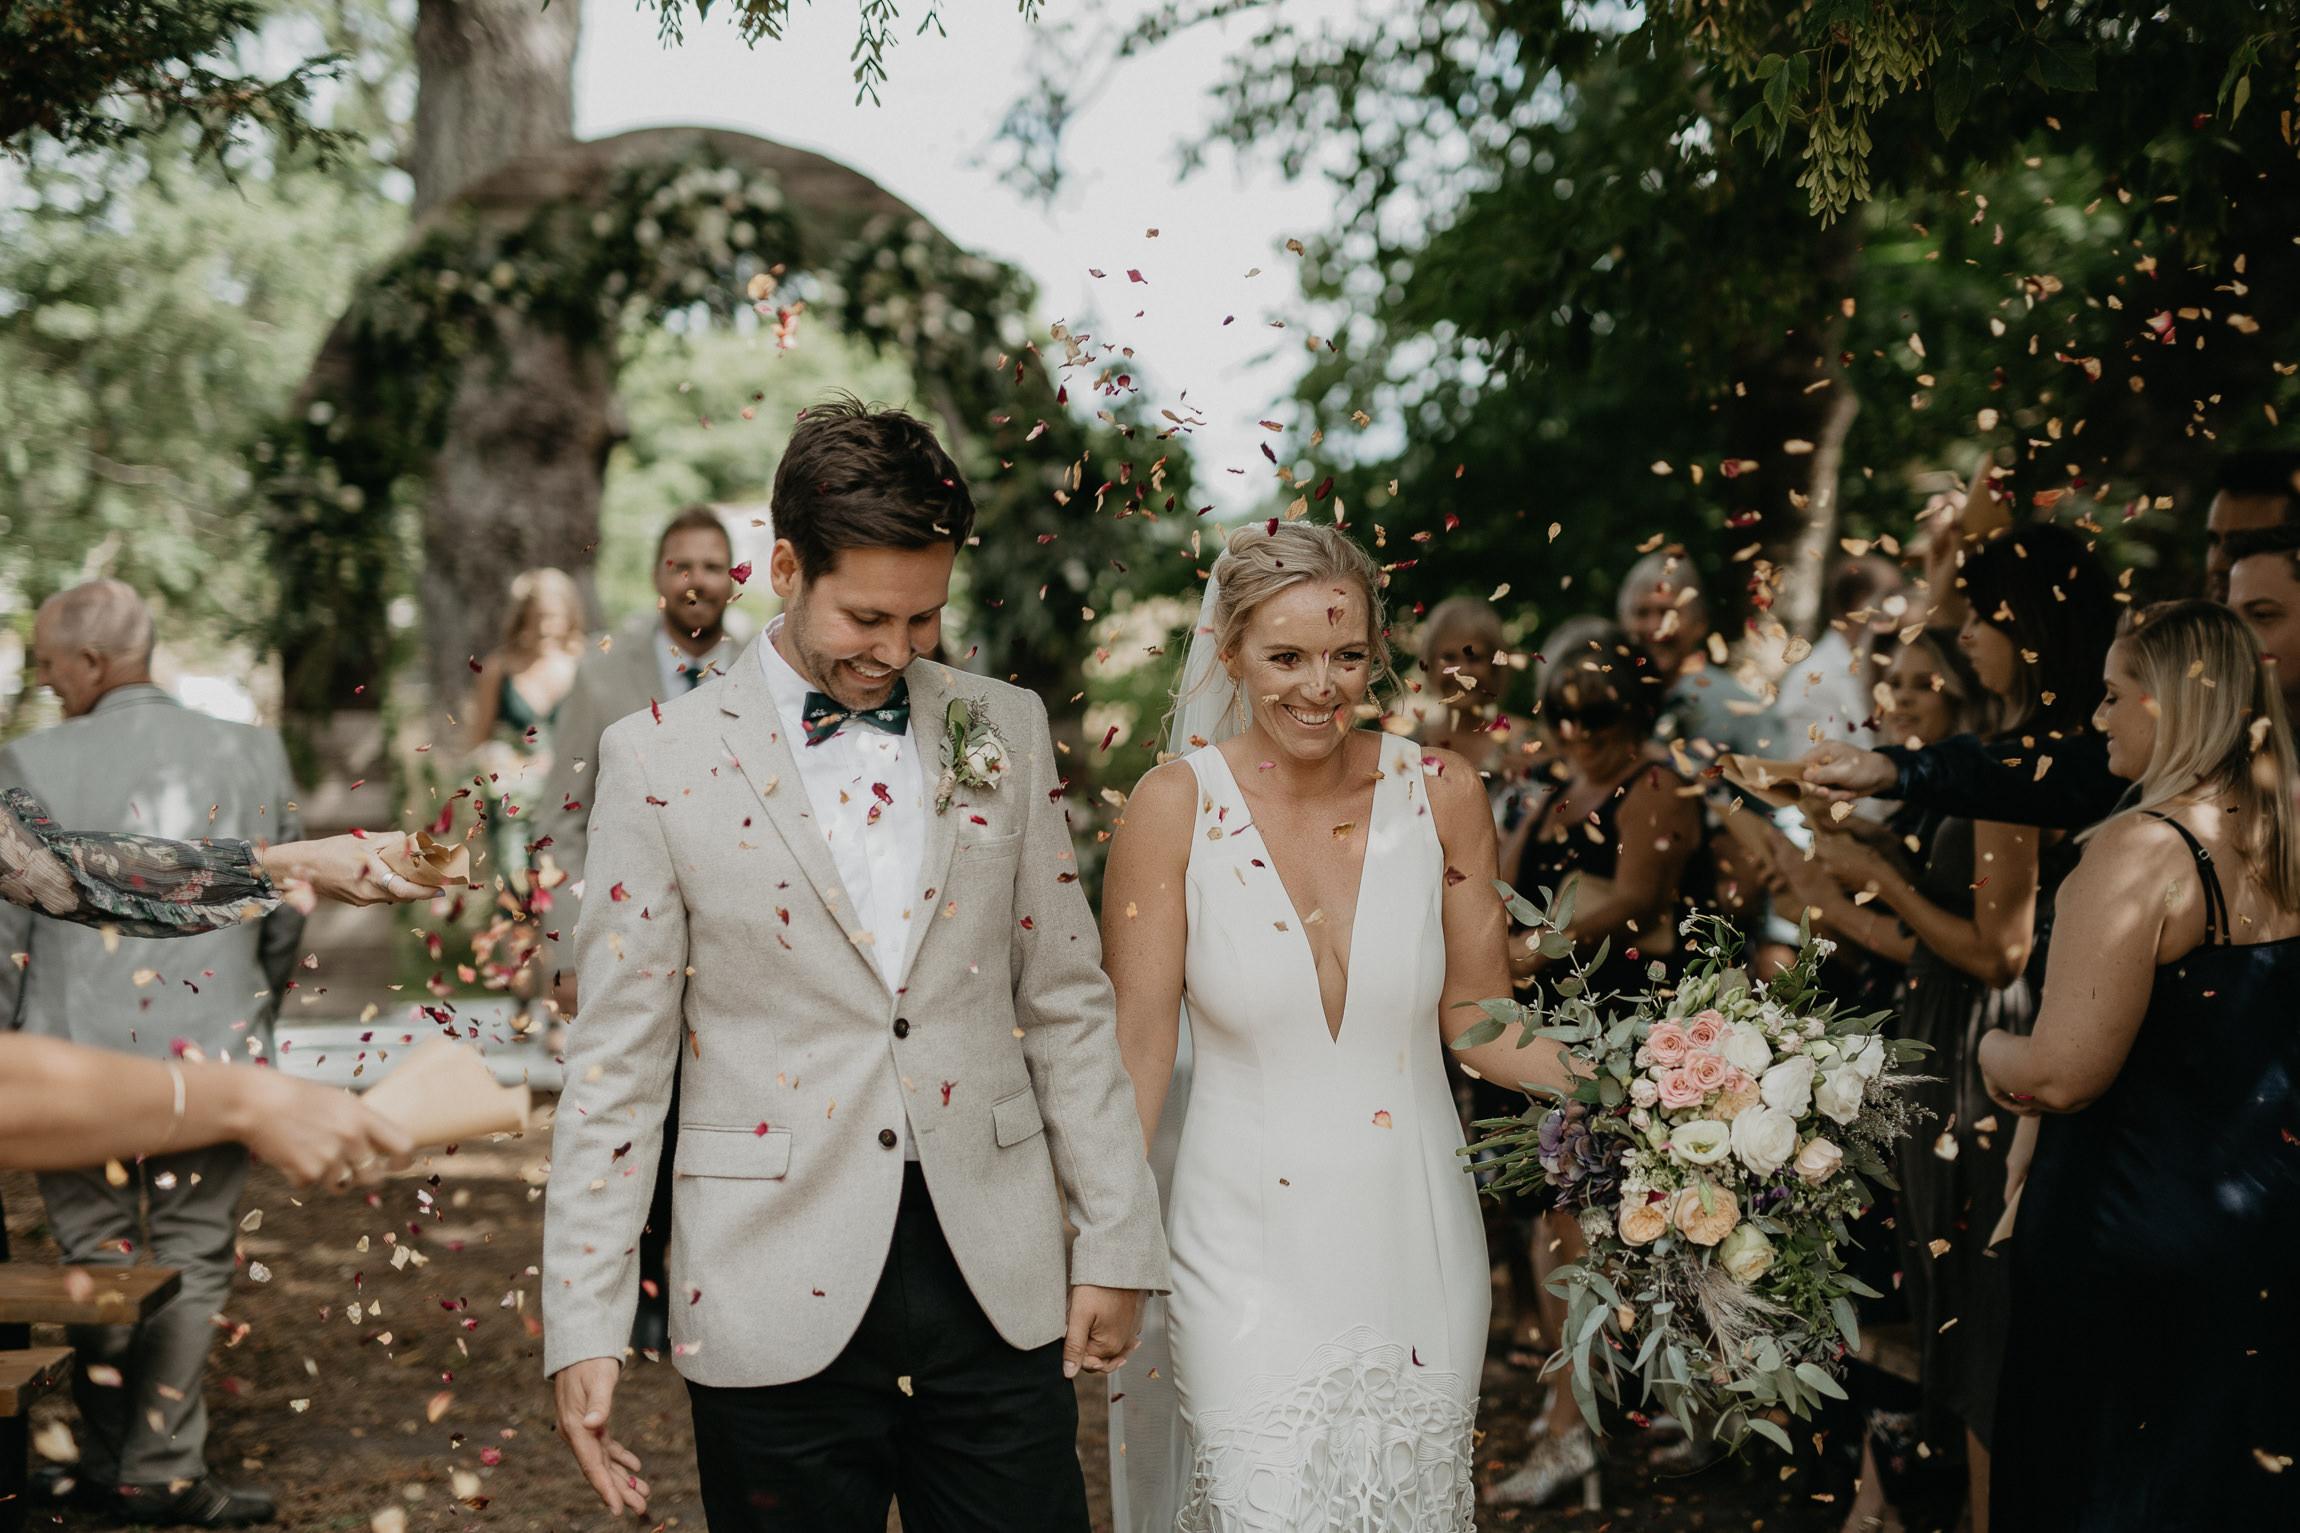 oldforestschool-wedding-blog-111.jpg